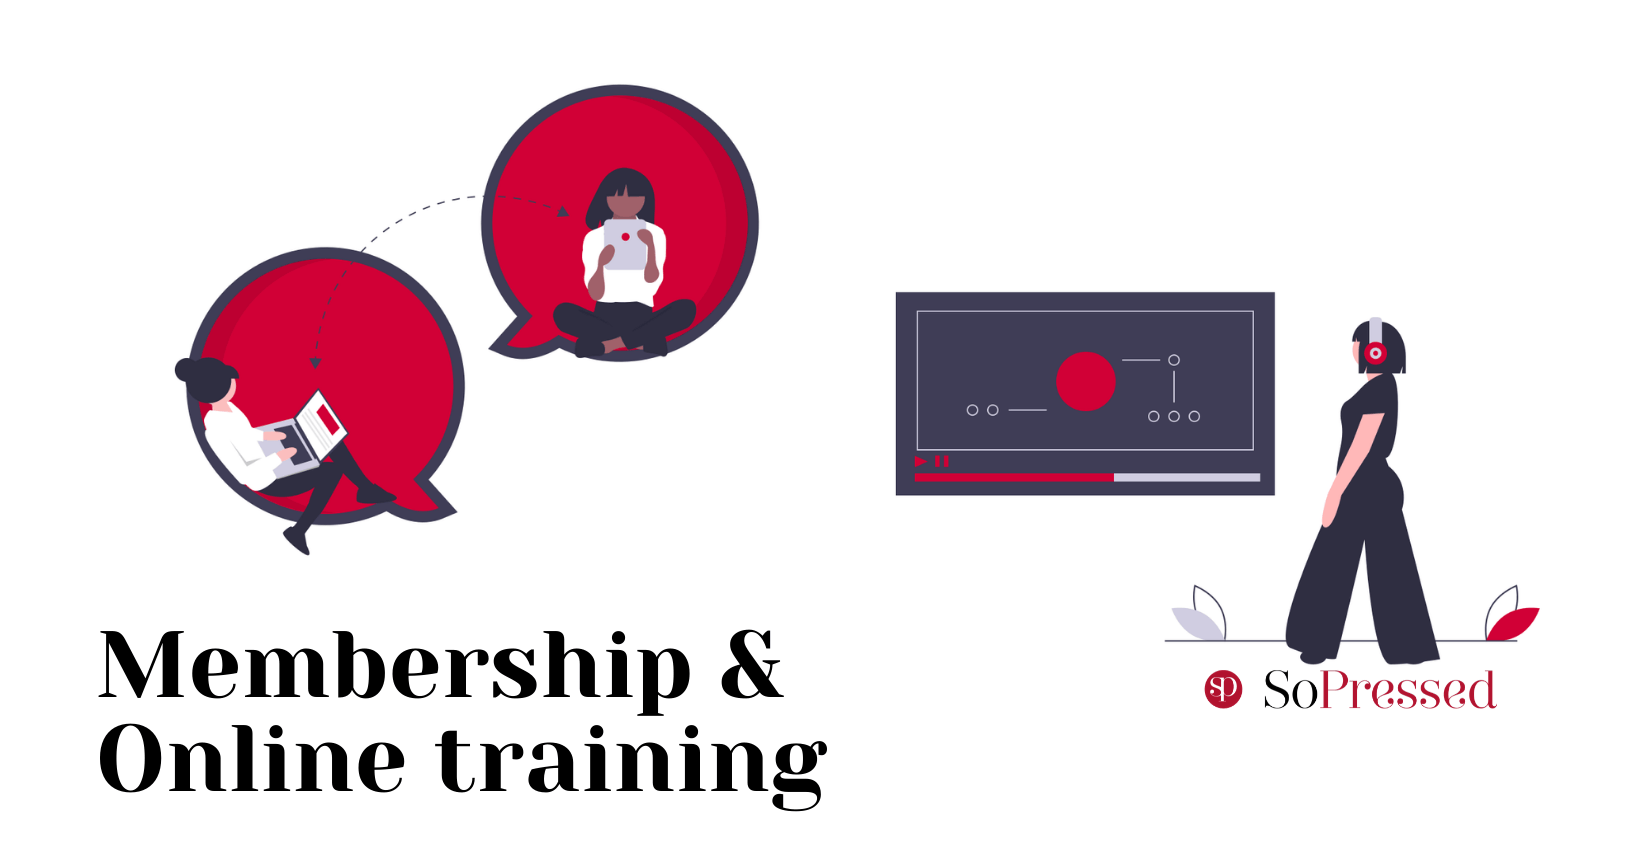 Divi Membership& online training blogpost